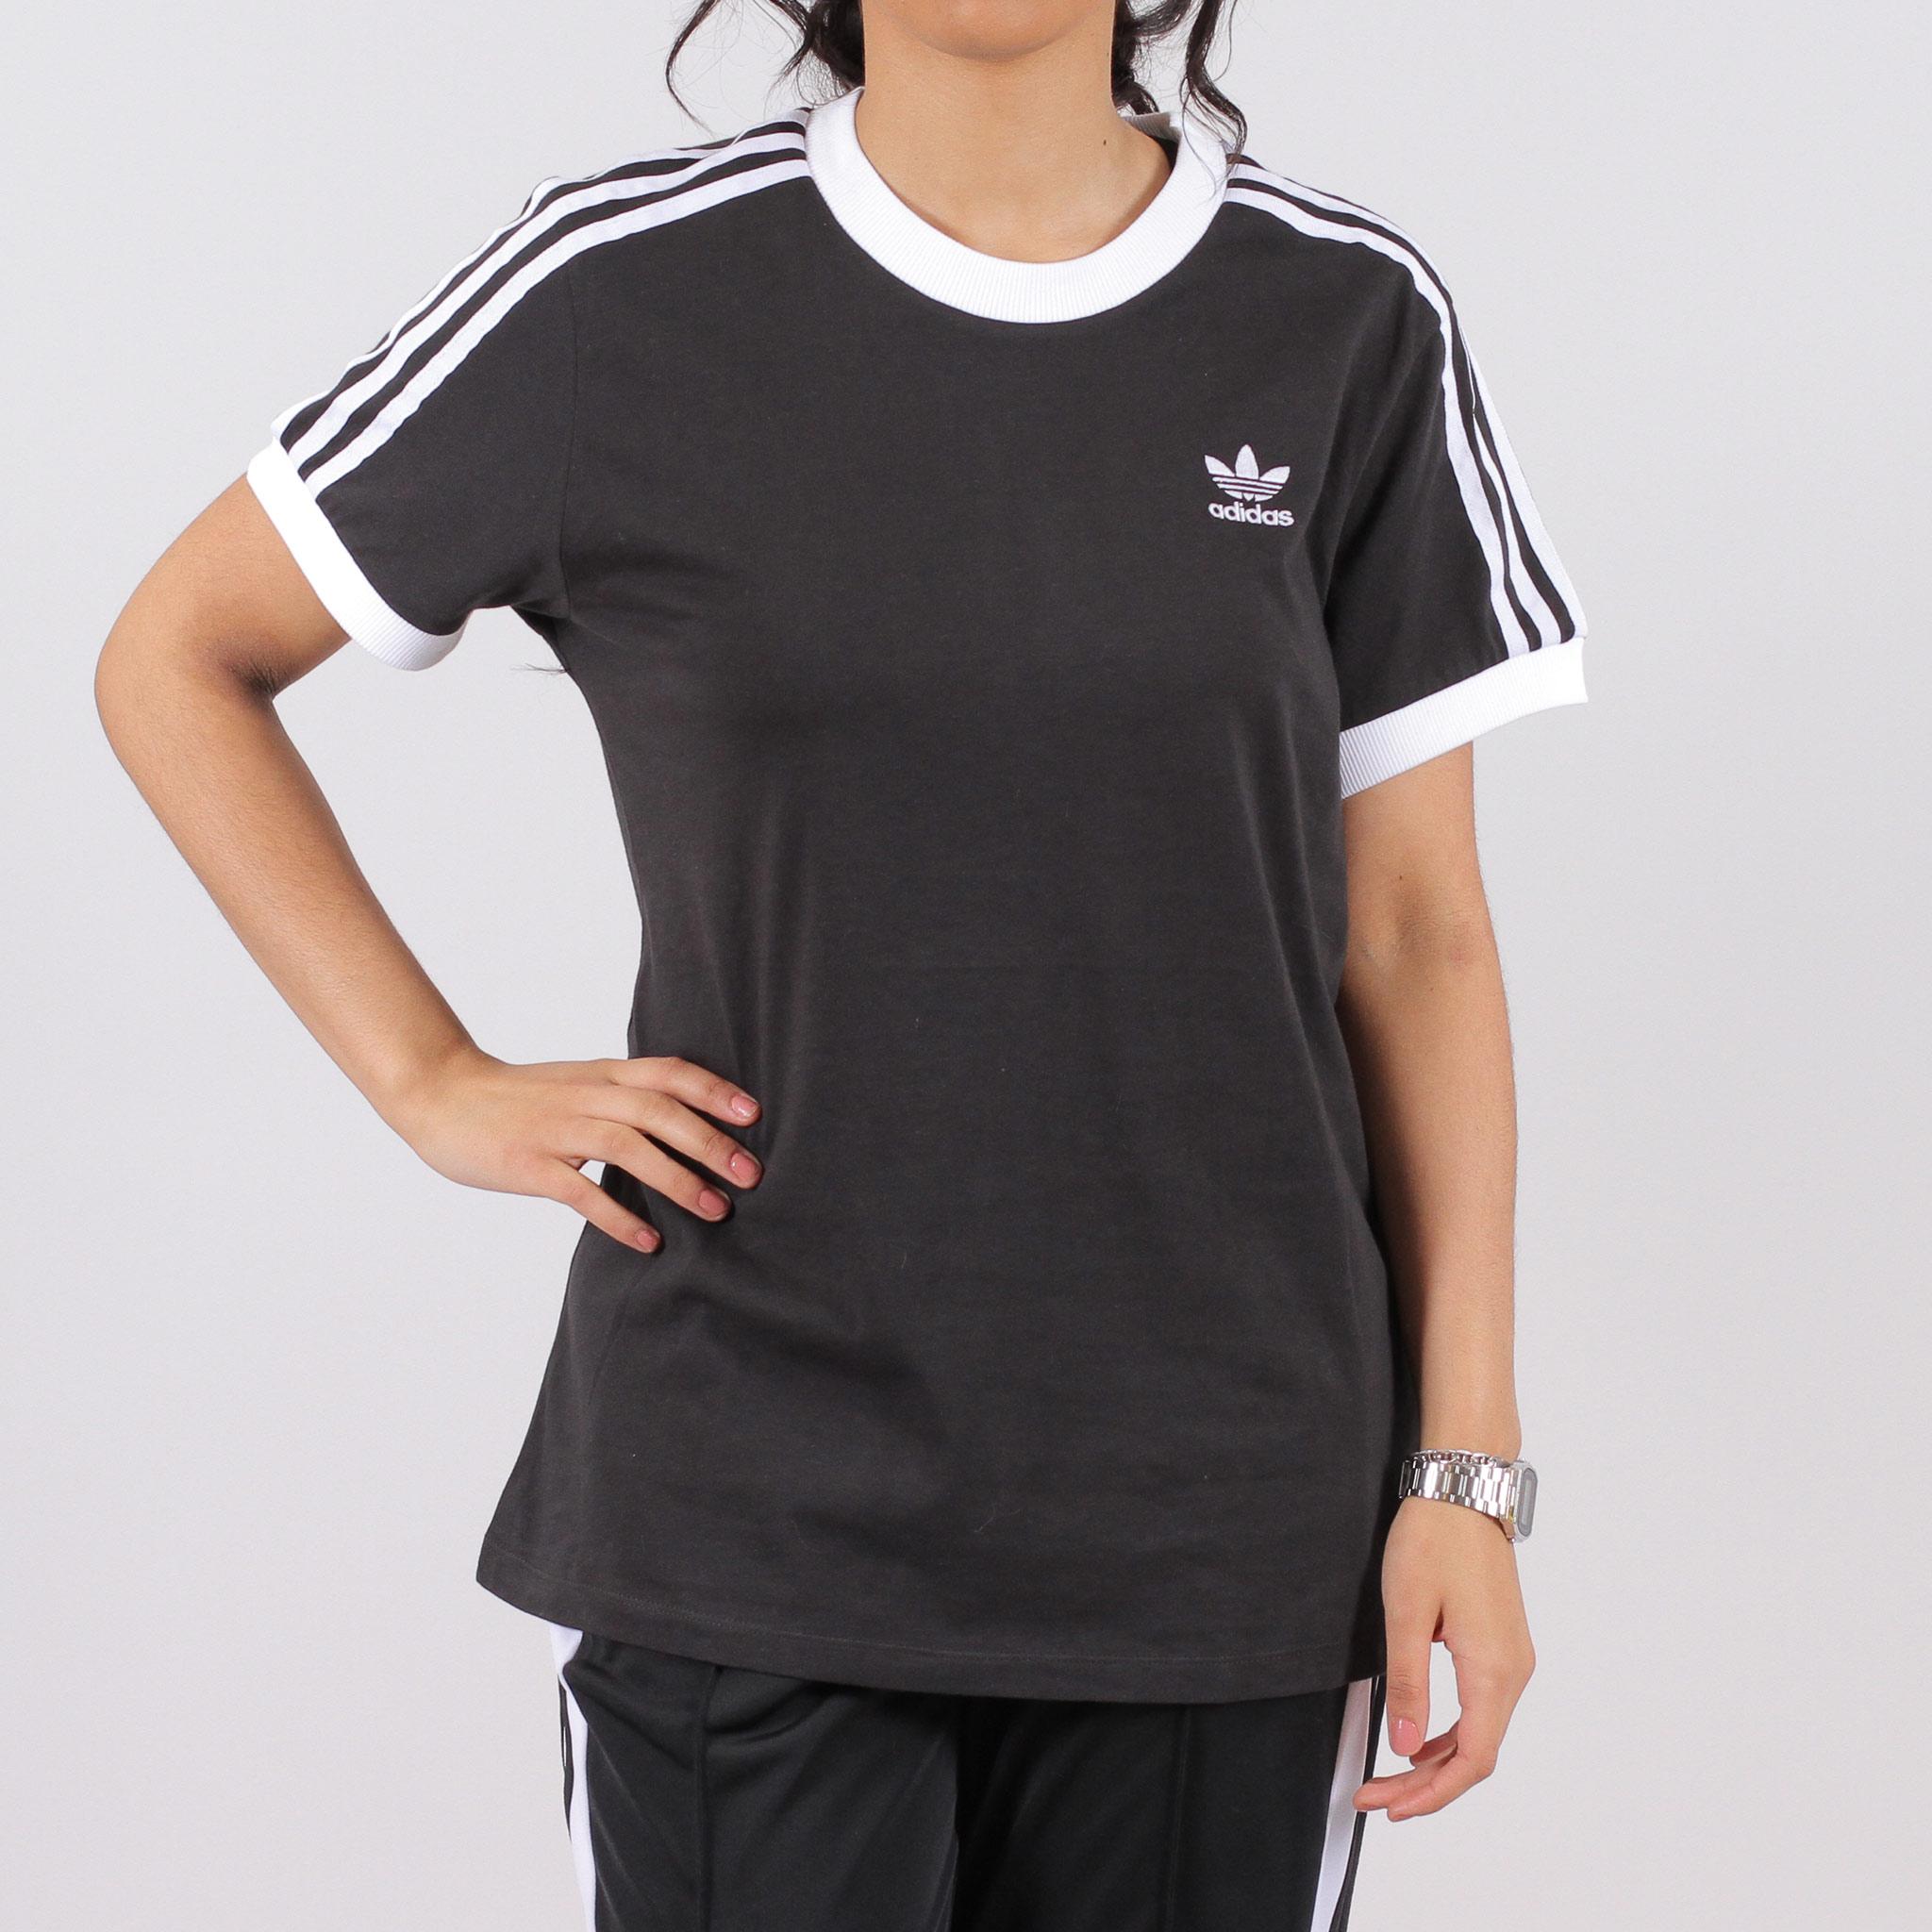 adidas Originals 3 Stripes Tee Men's T Shirt #adidas